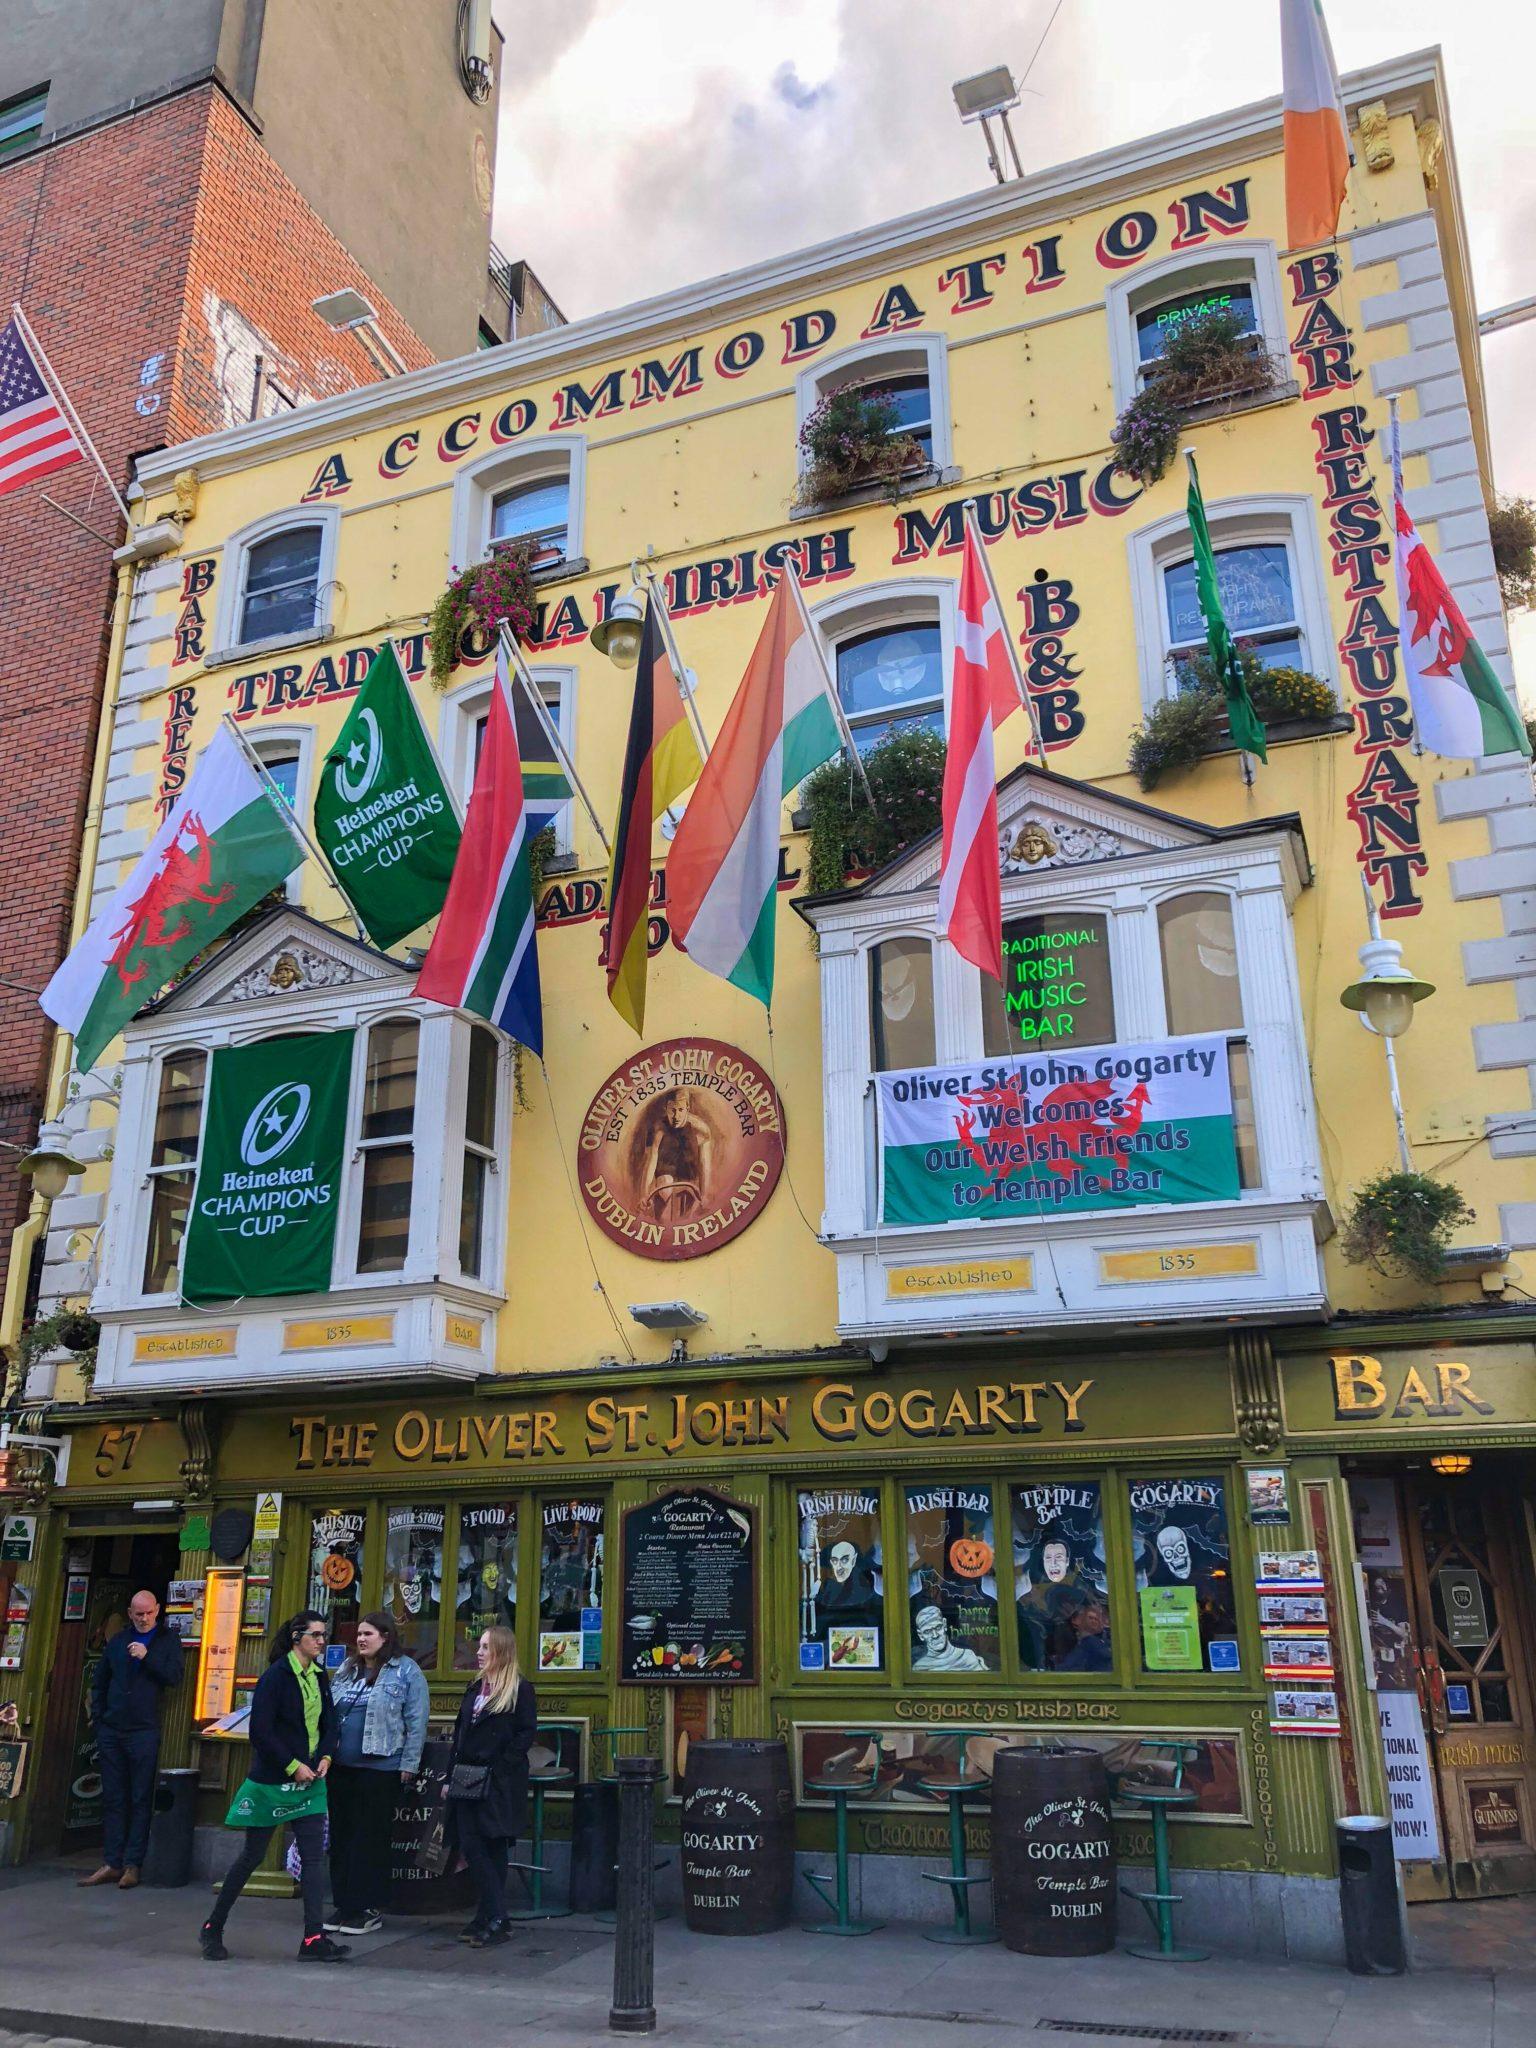 templebar-dublin-irlande-europe-voyage-visite